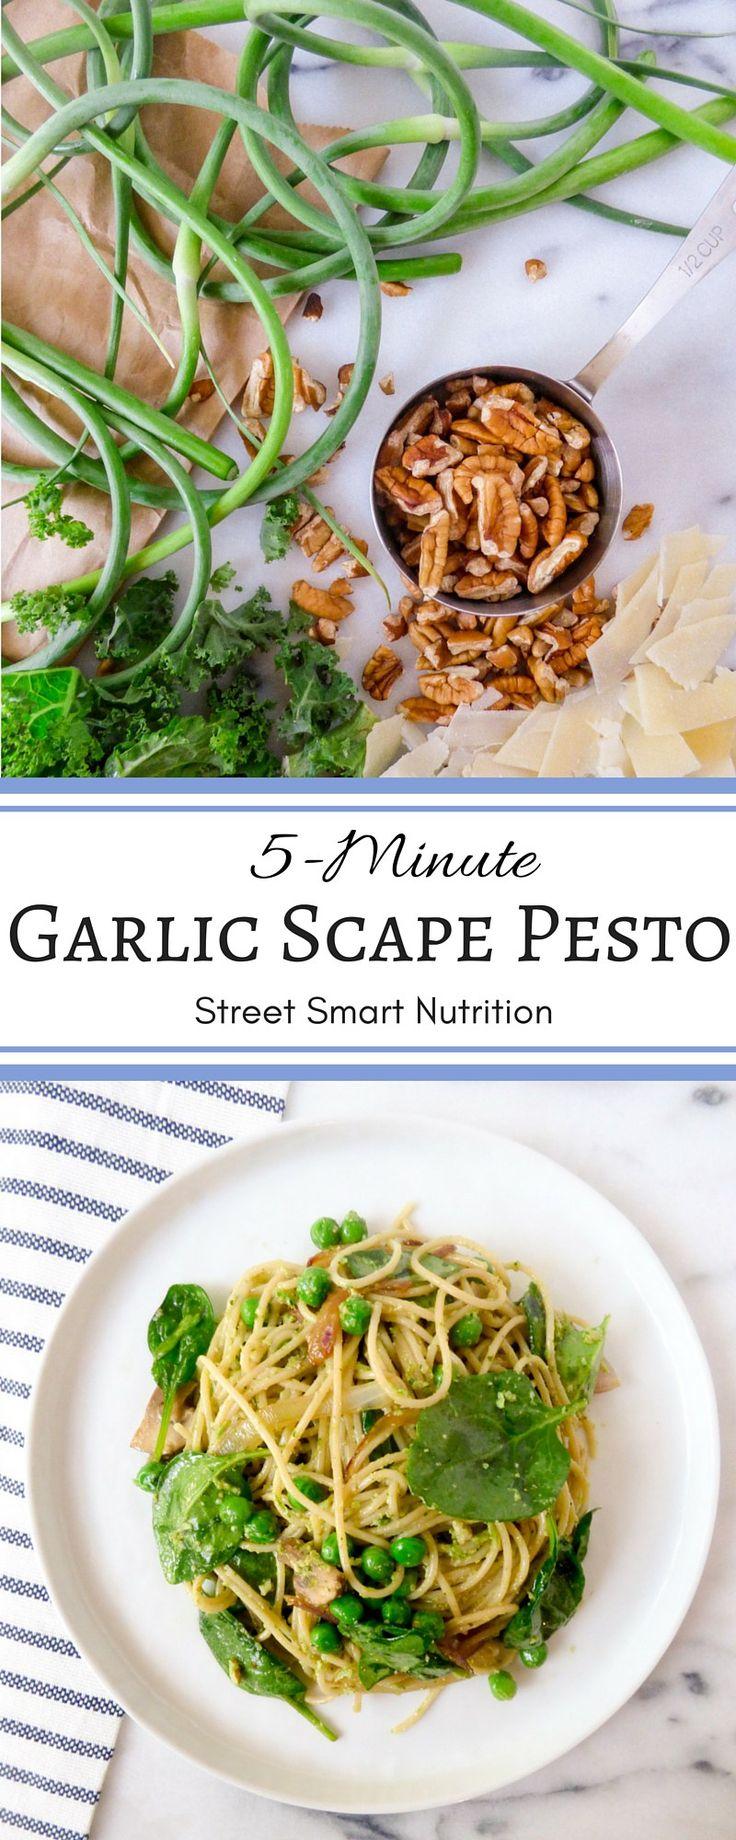 5-Minute Garlic Scape Pesto | Street Smart Nutrition Blog